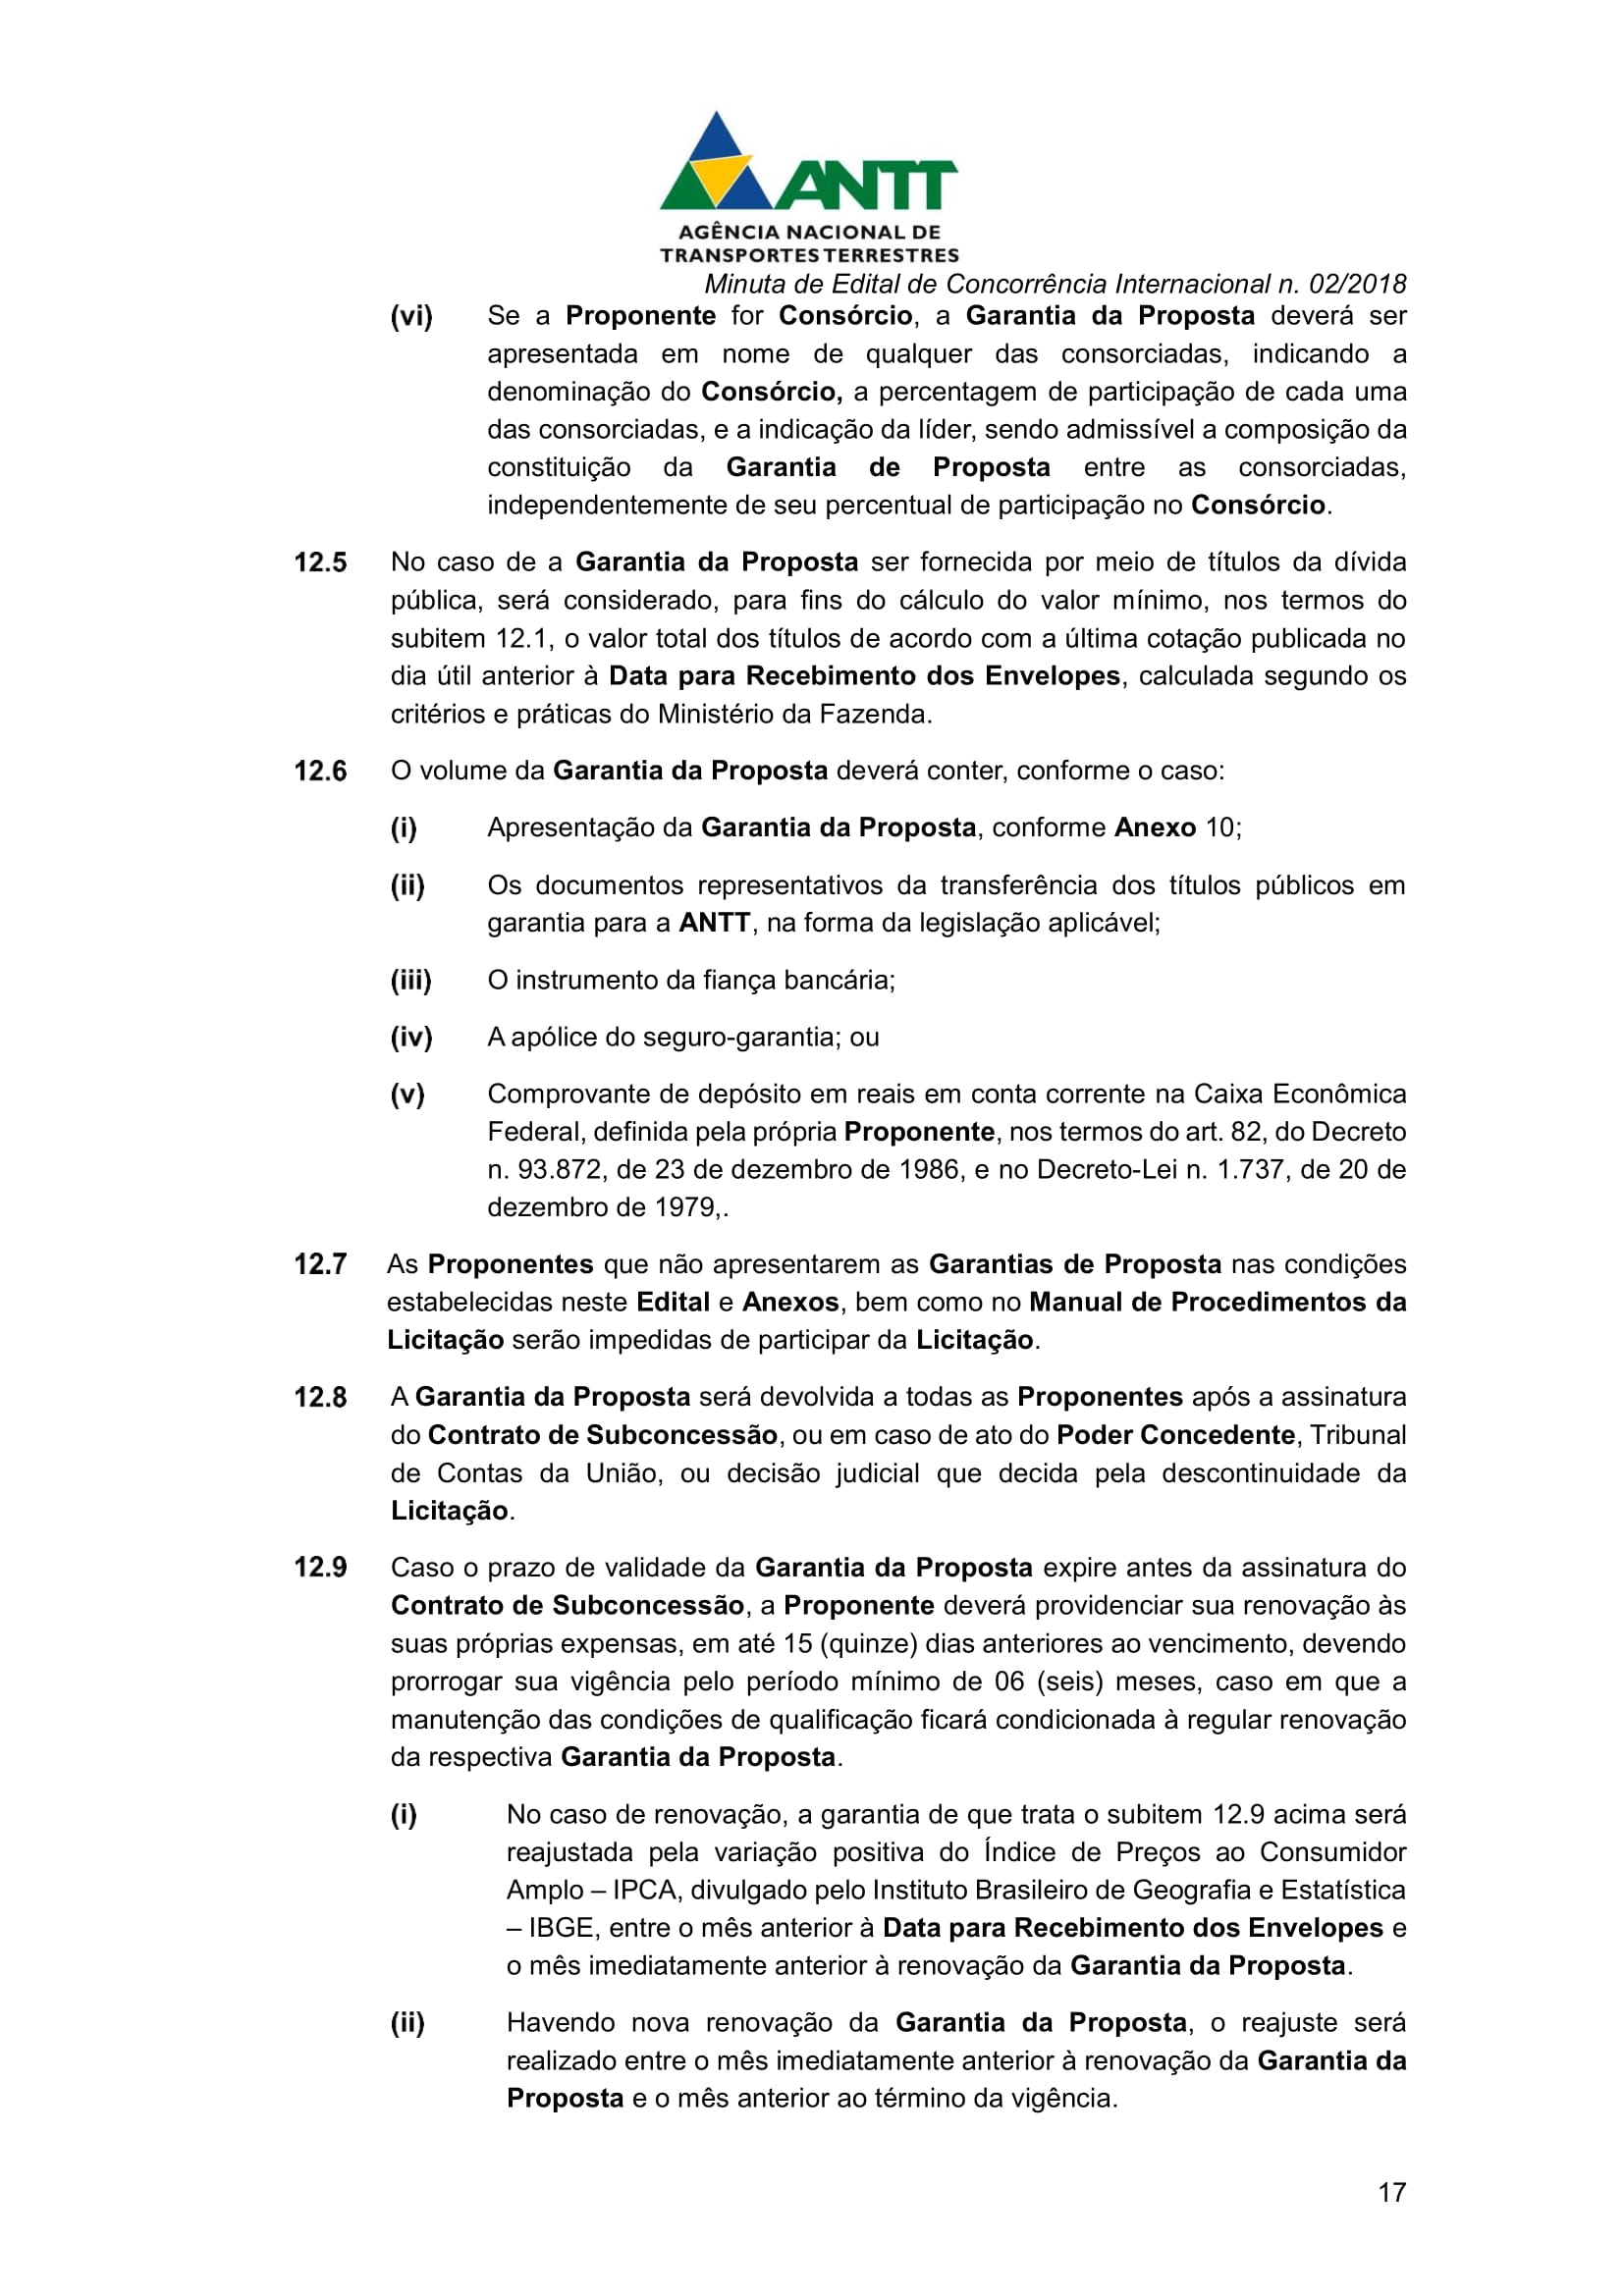 minuta_de_edital_-_porto_nacional-estrela_doeste-17